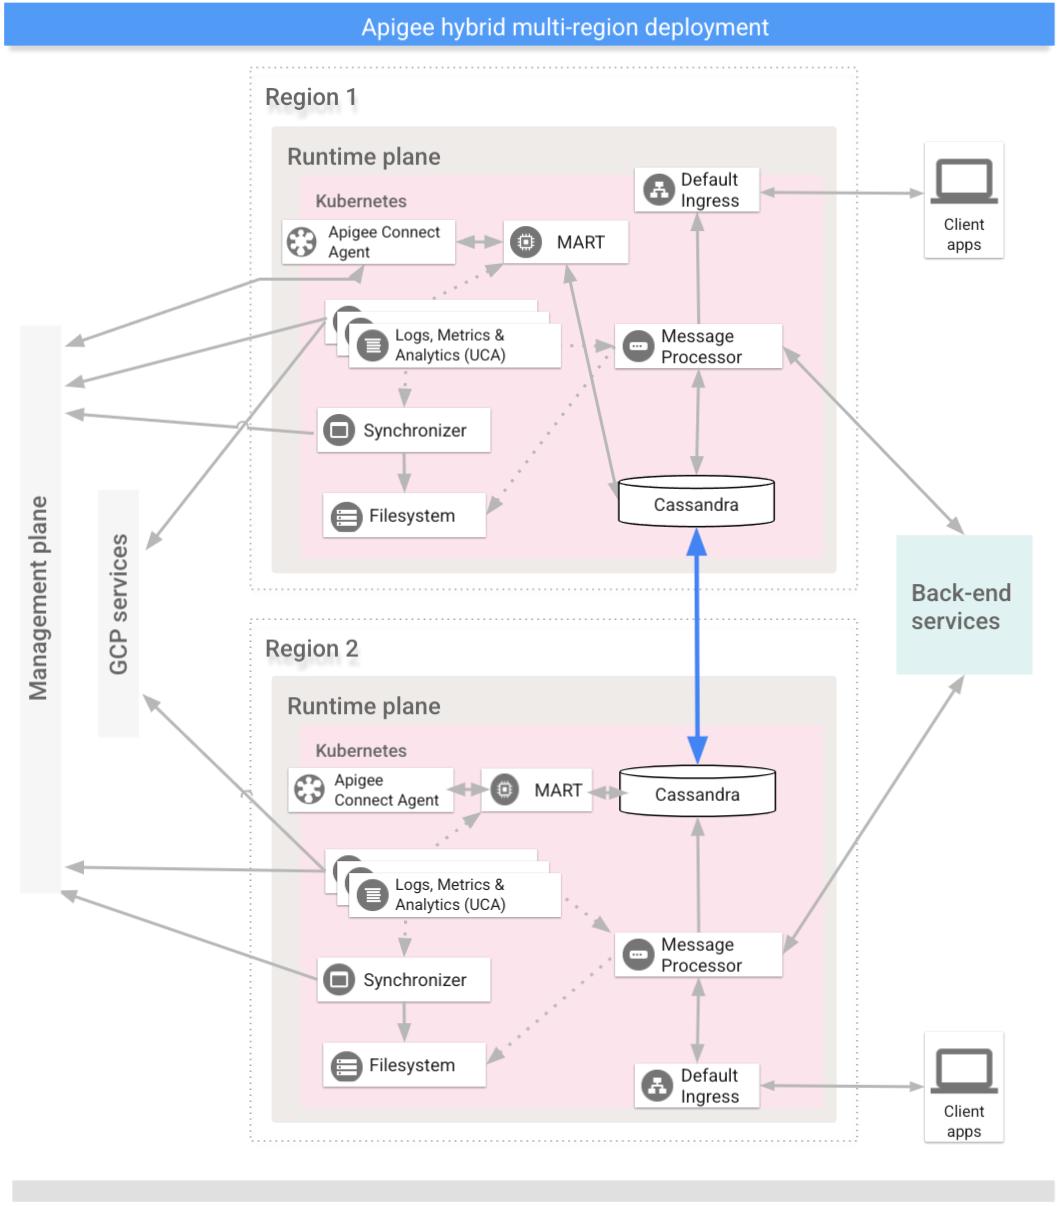 Multi-region deployment | Apigee Hybrid Beta 2 | Apigee Docs